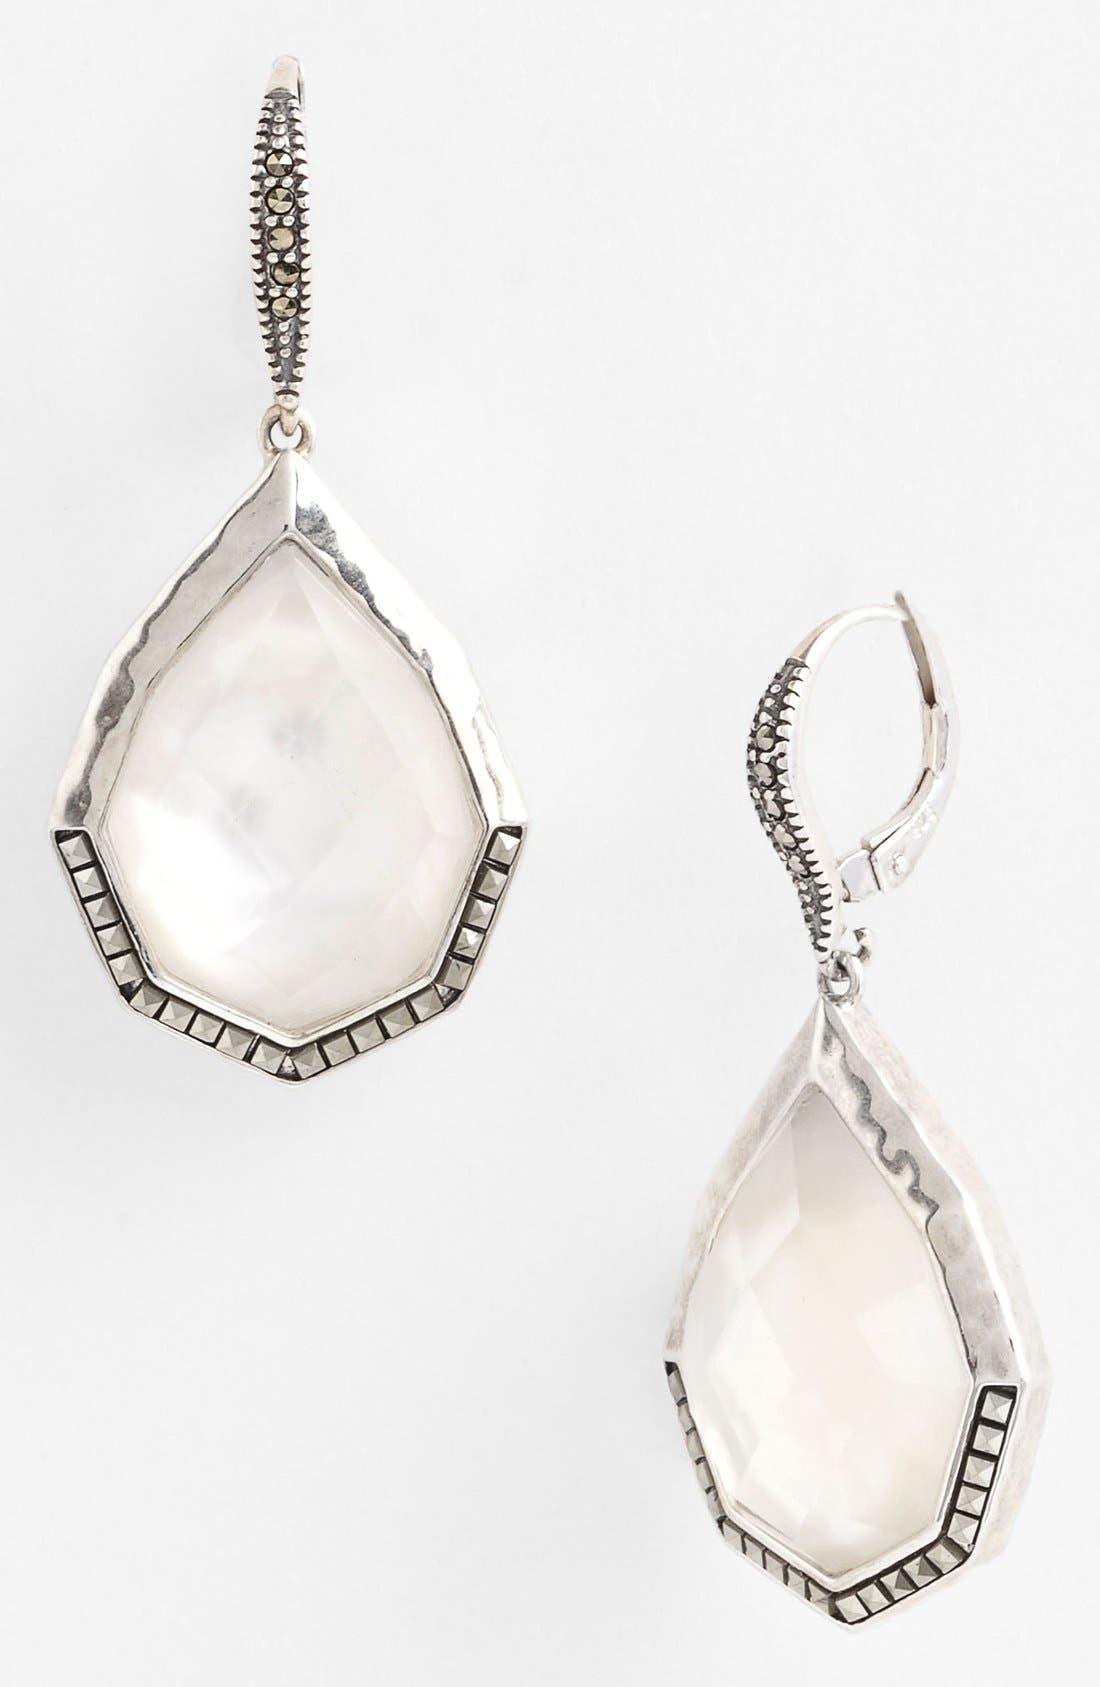 Main Image - Judith Jack 'Waterfall' Large Drop Earrings